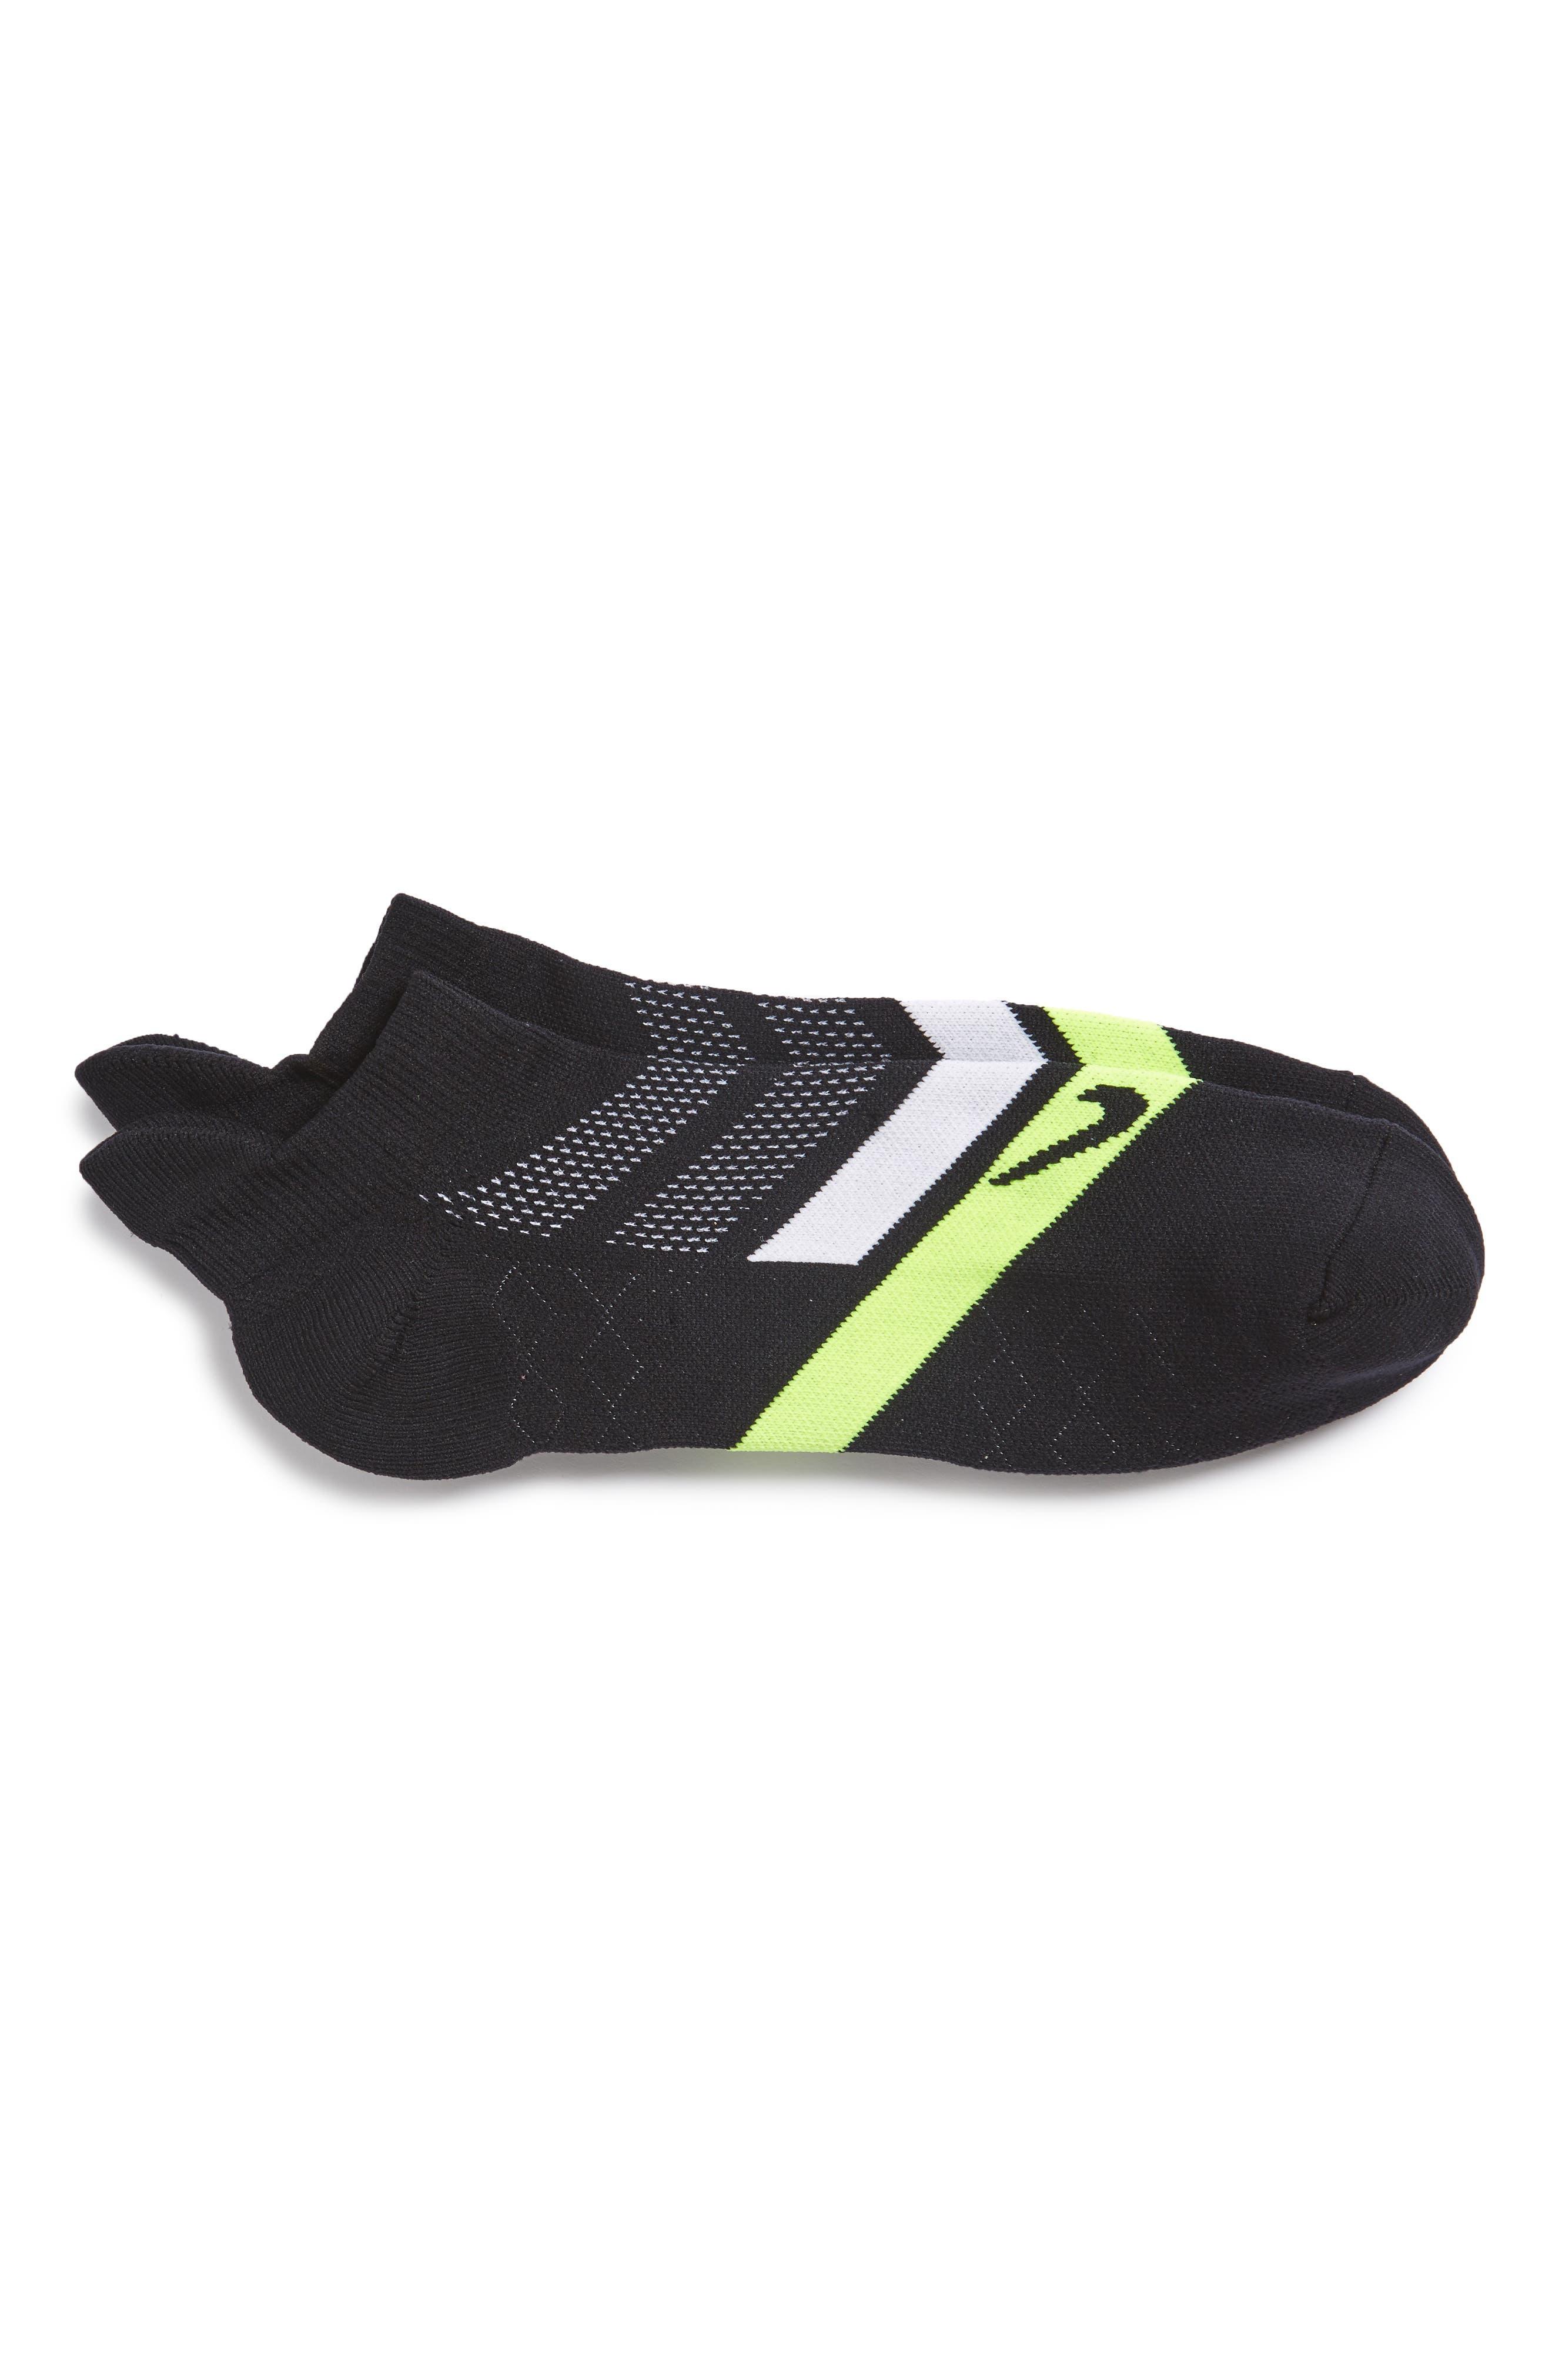 NIKE Performance Cushion No-Show Socks, Main, color, 010